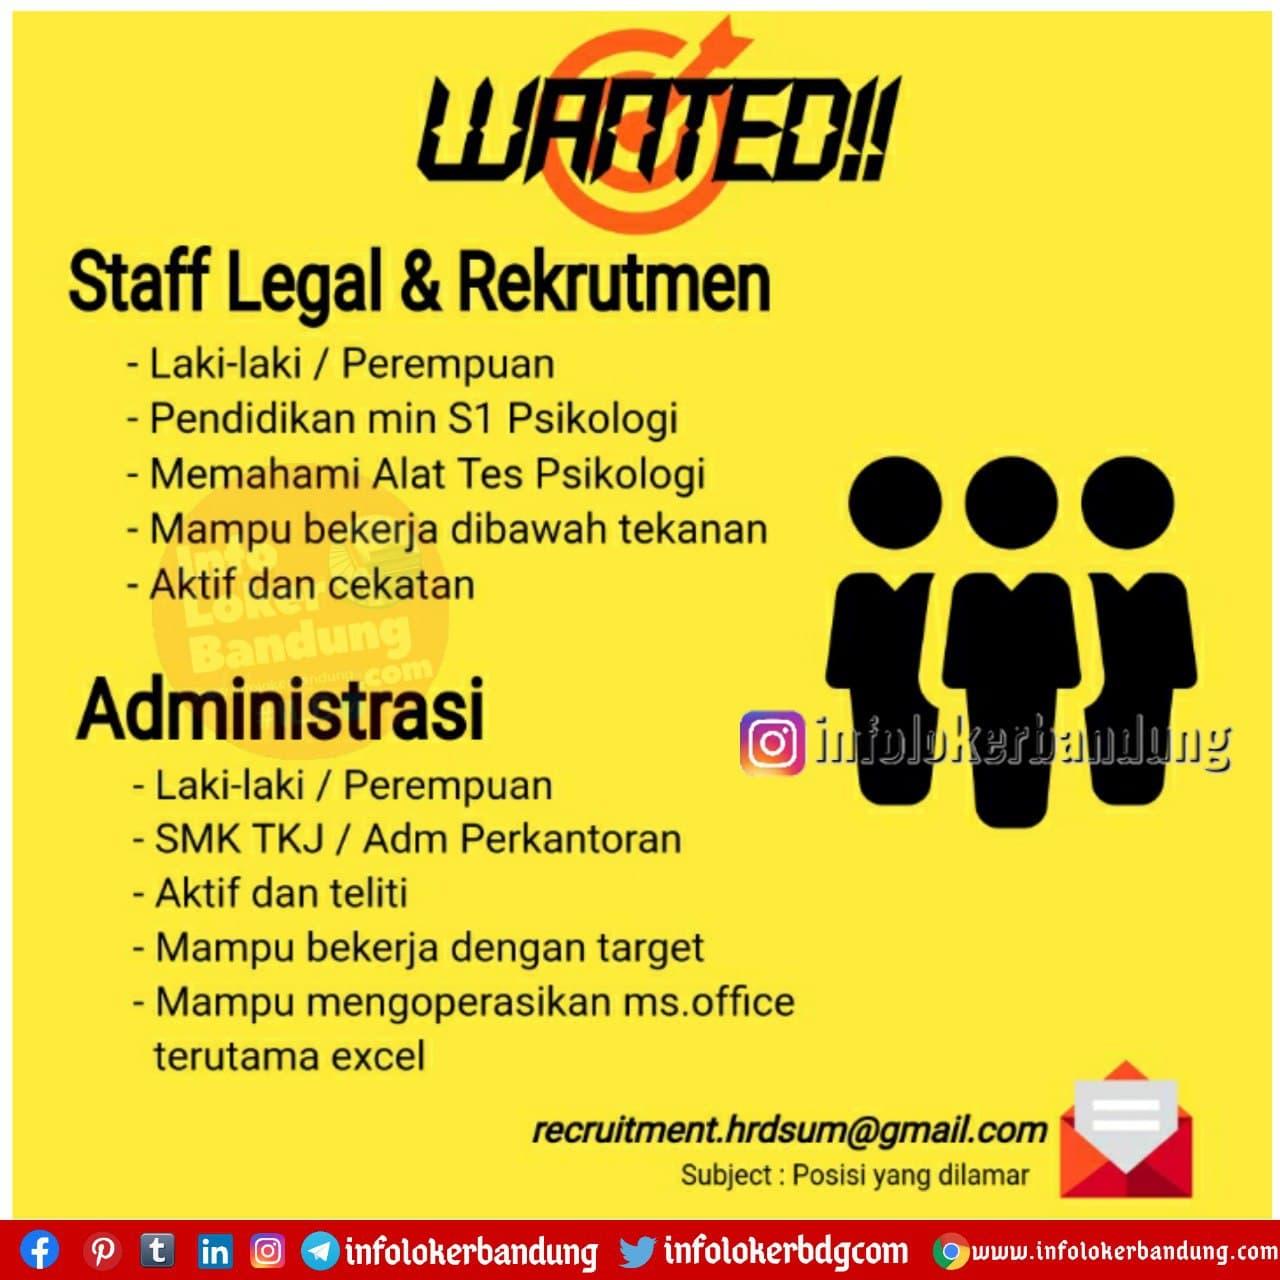 Lowongan Kerja PT. Suraya Usaha Mandiri Bandung Januari 2021